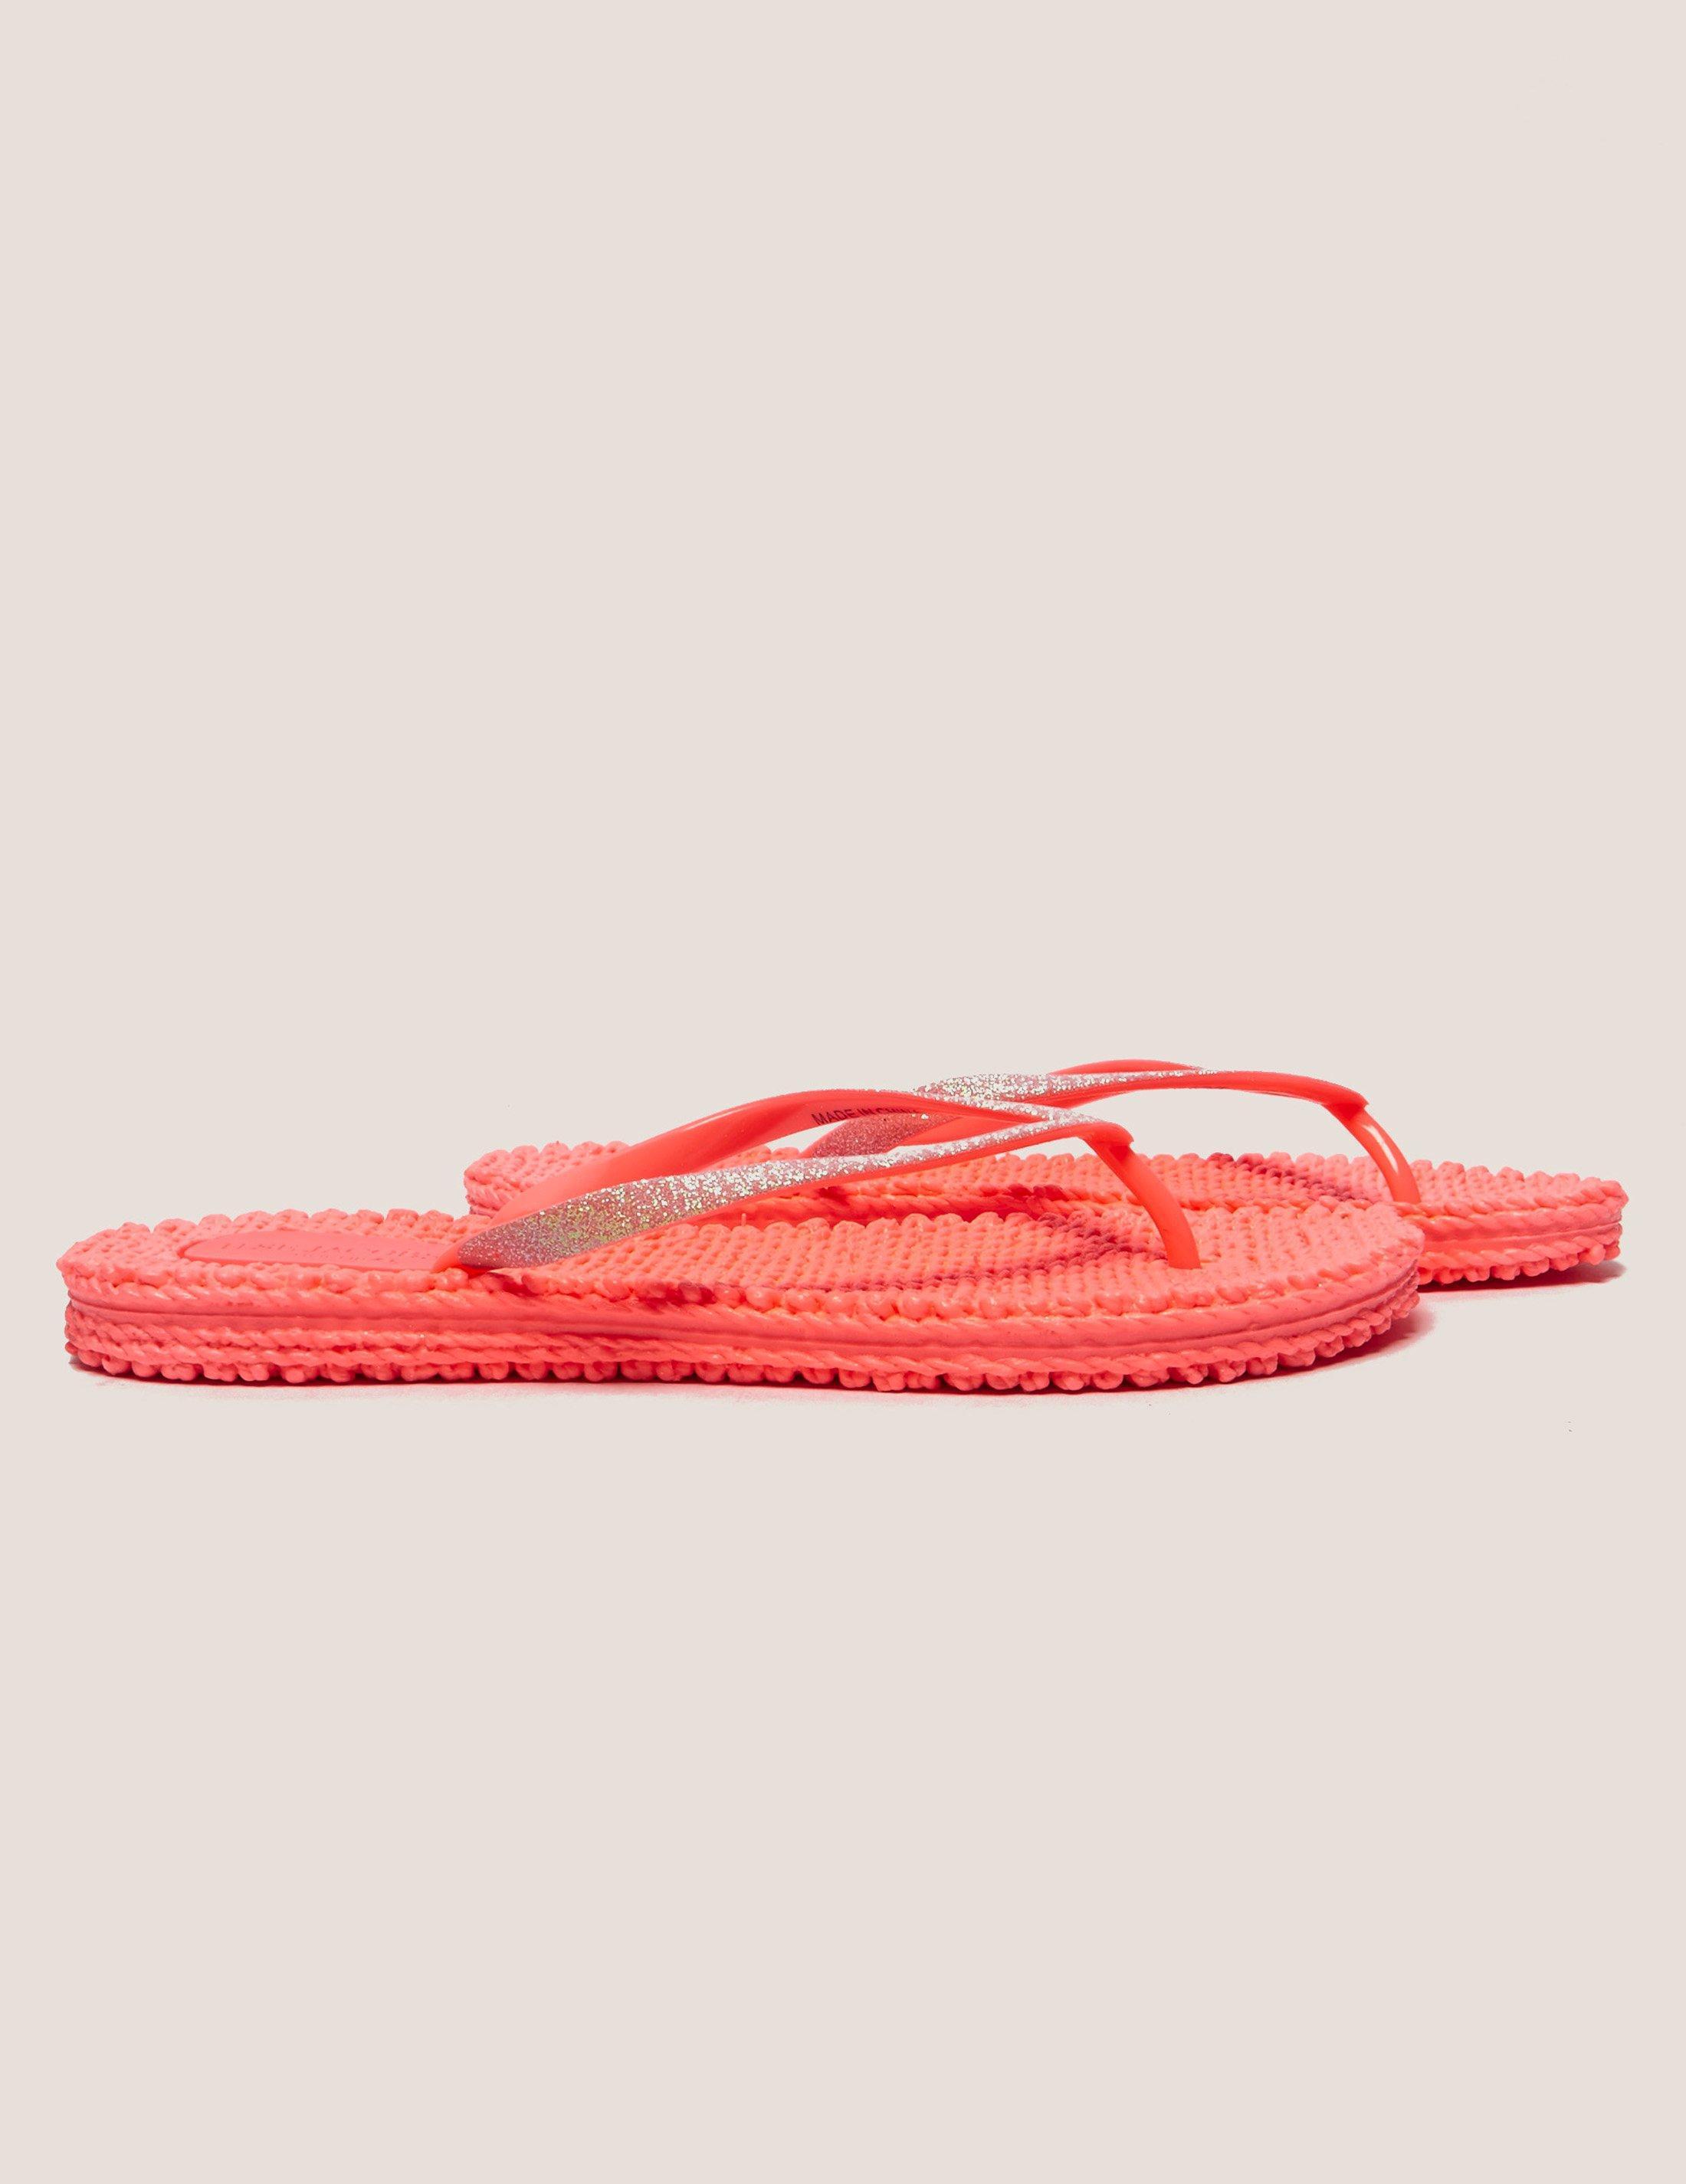 6fdd0c6c702f Ilse Jacobsen Womens Glitter Flip Flops Pink pink